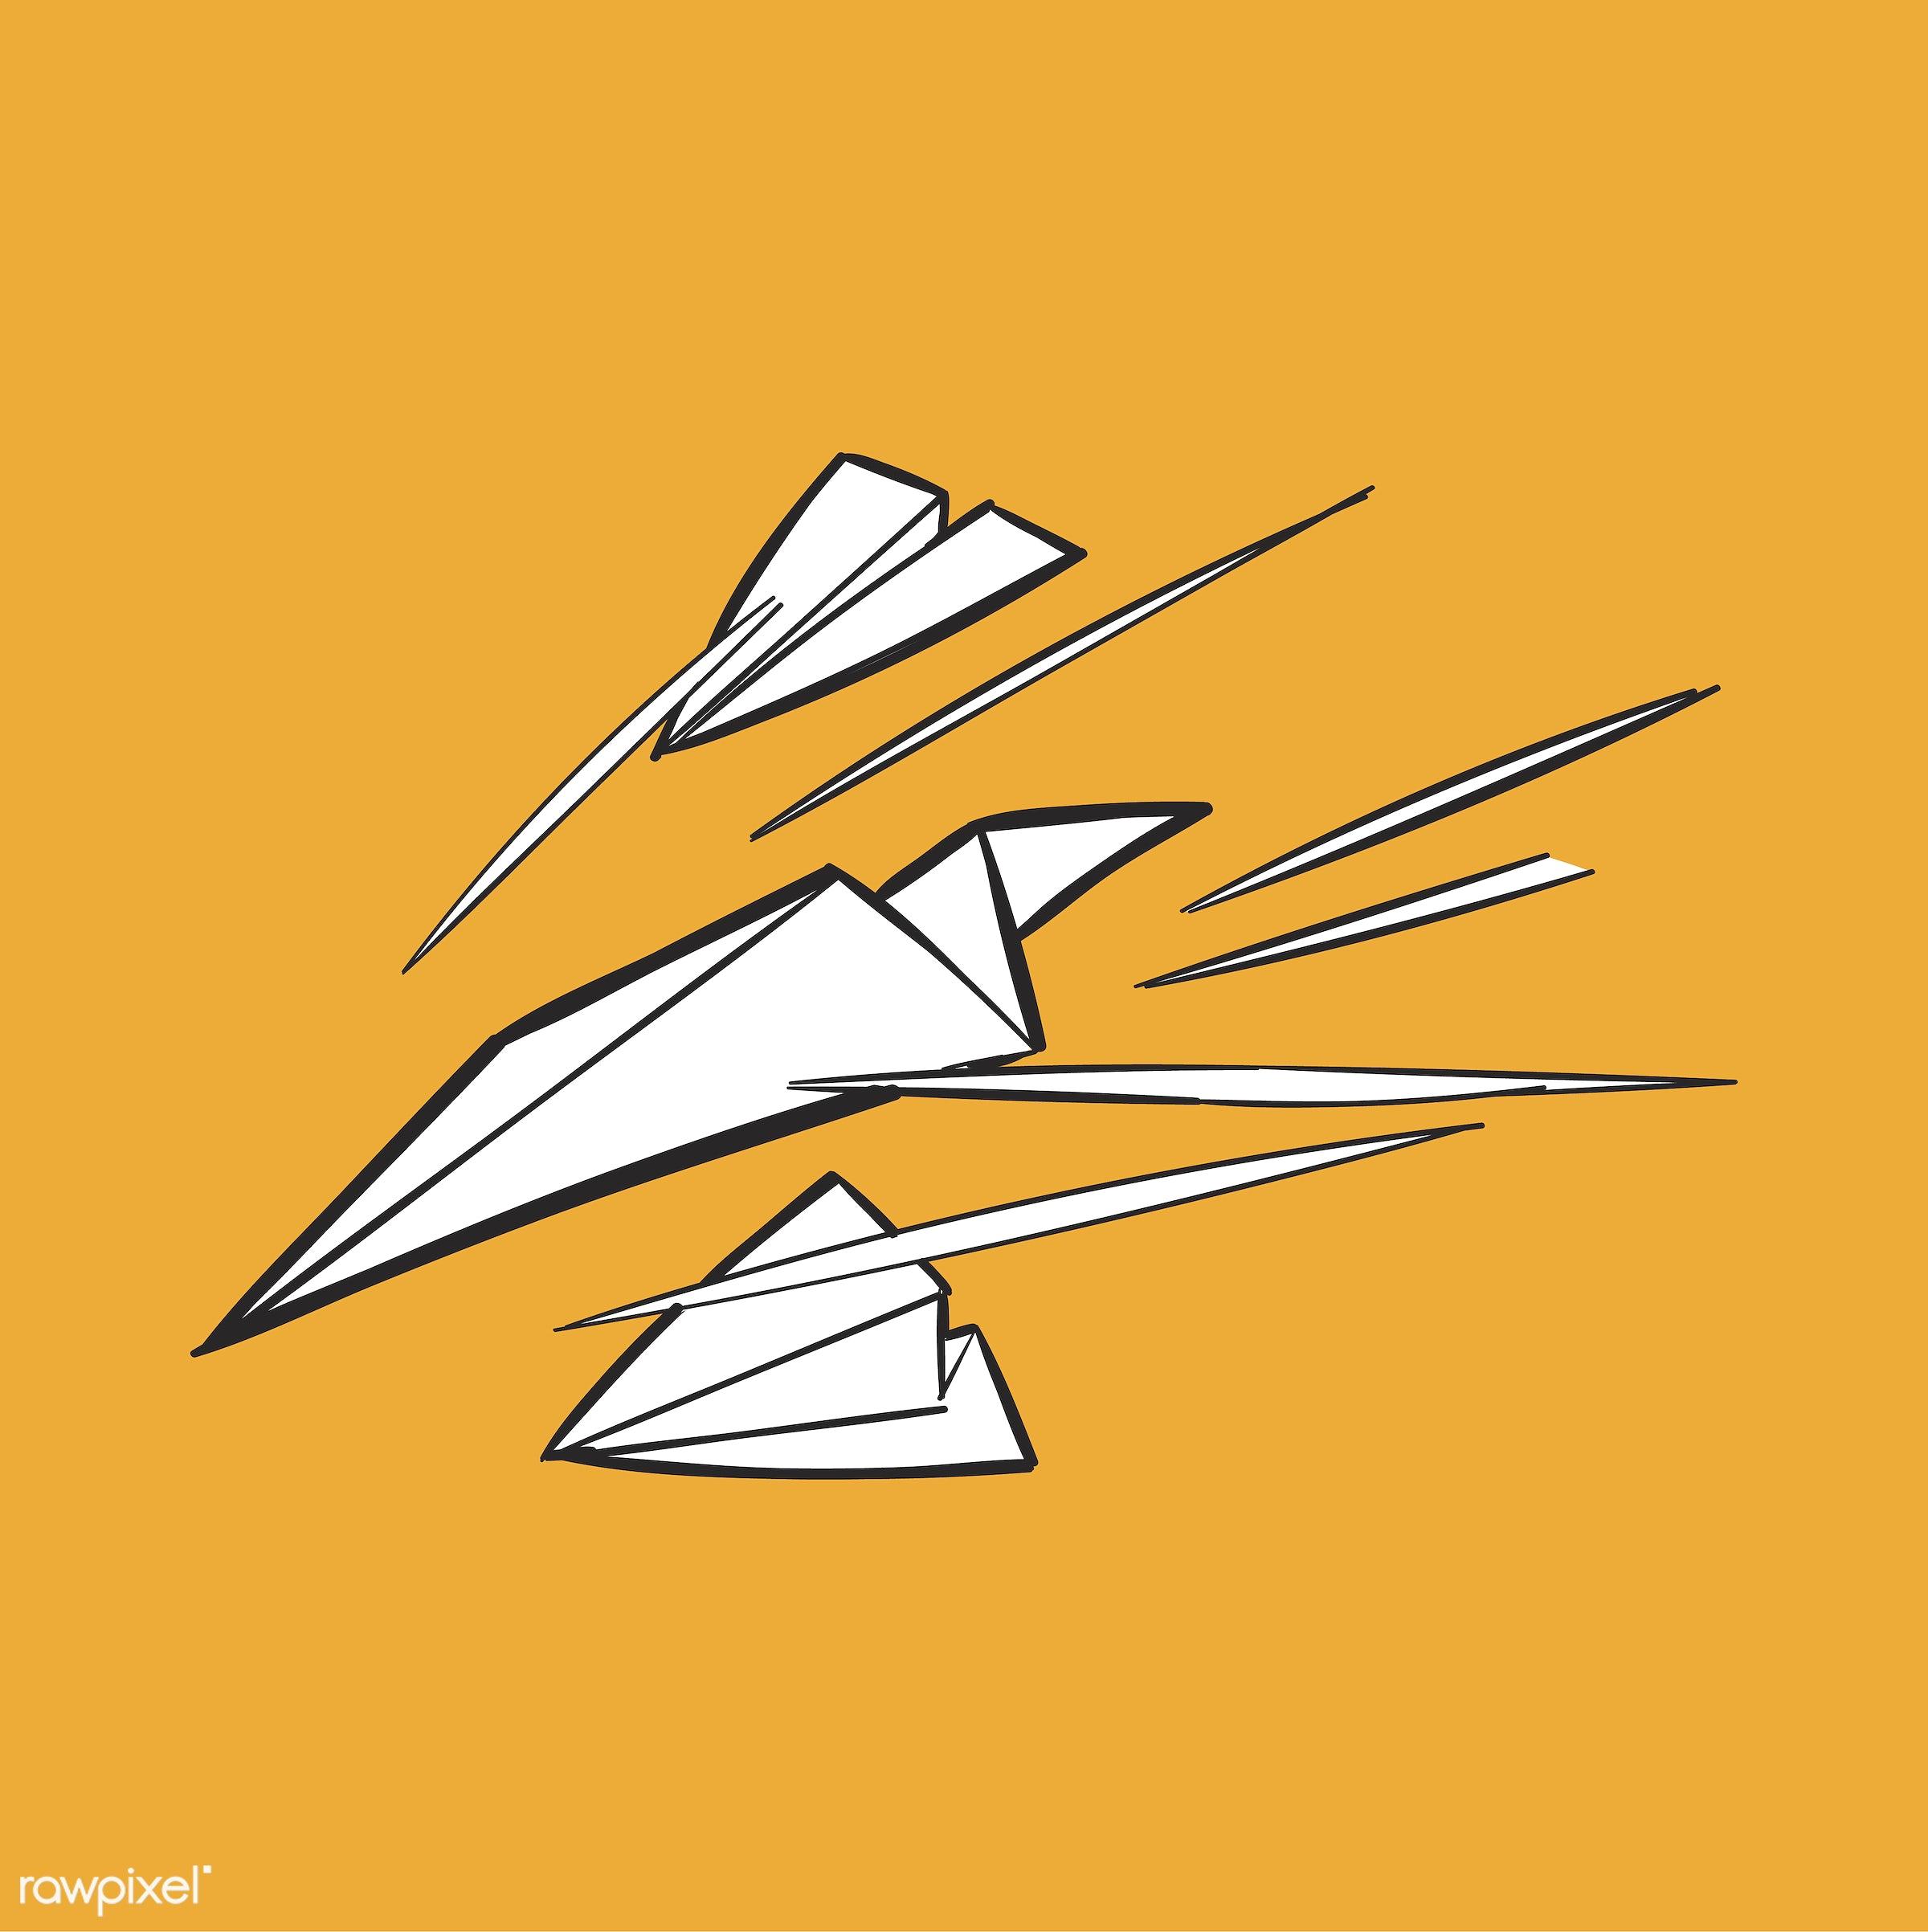 art, artwork, creative, creativity, design, draw, drawing, drawn, fail, fall, graphic, hand drawing, hopeless, icon,...